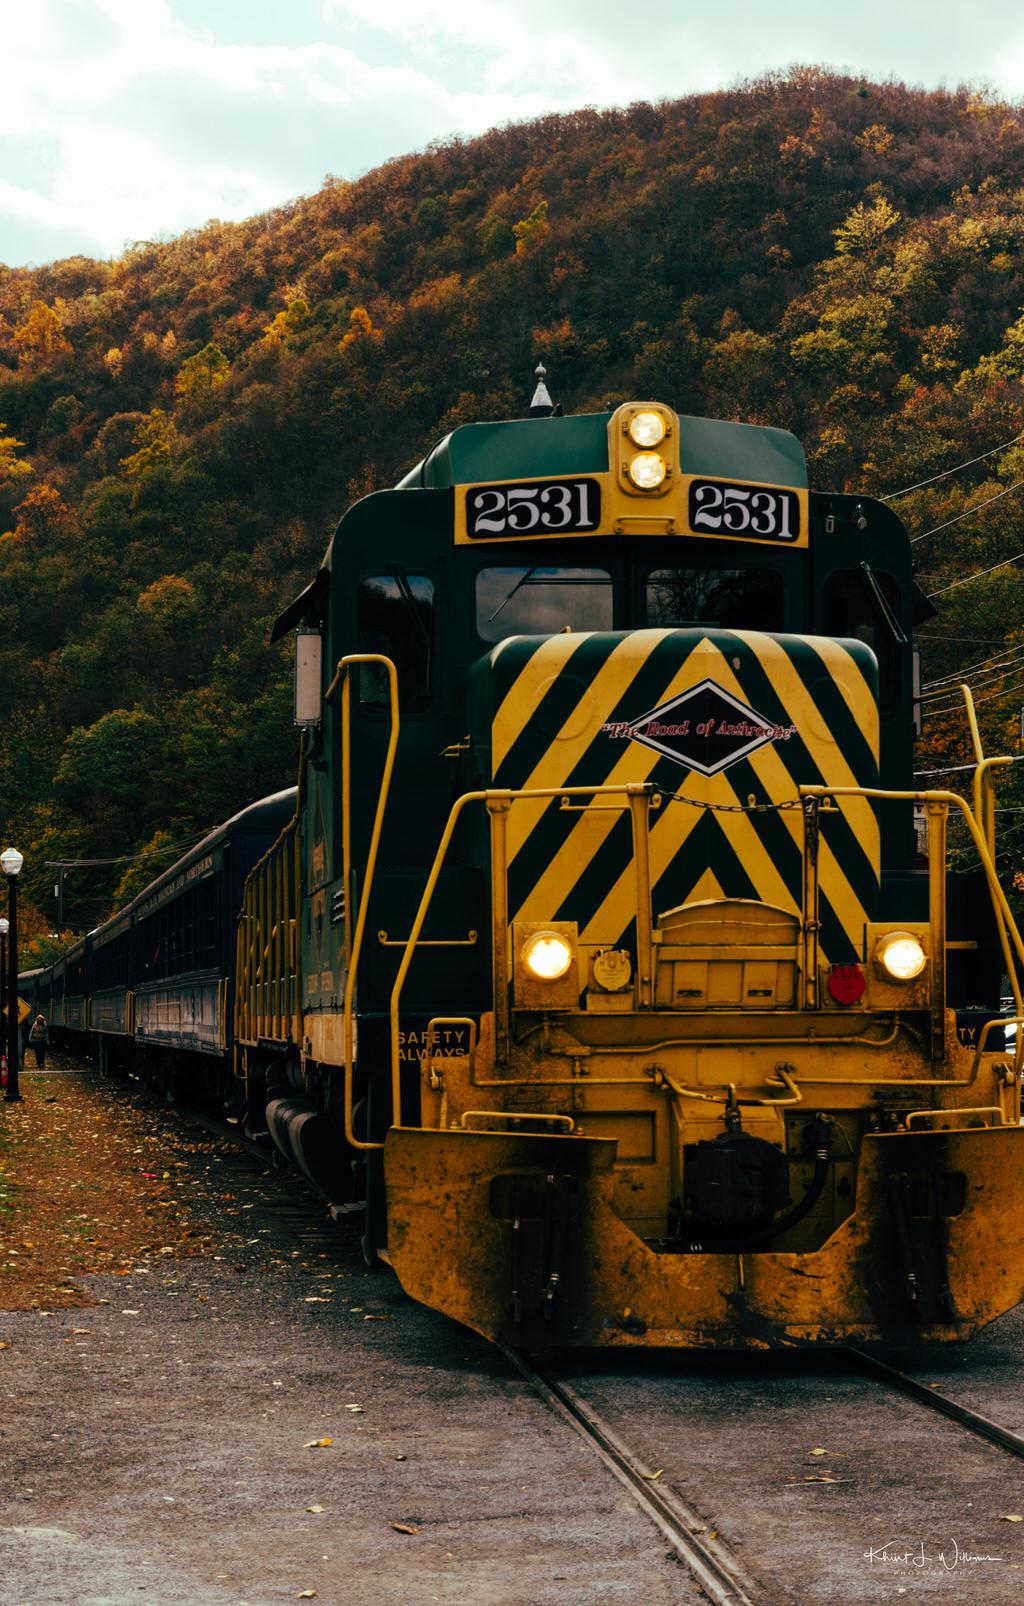 Lehigh Gorge Railway Jim Thorpe Autum Leaf Excursion NIKON D5100 20161023 5118 1